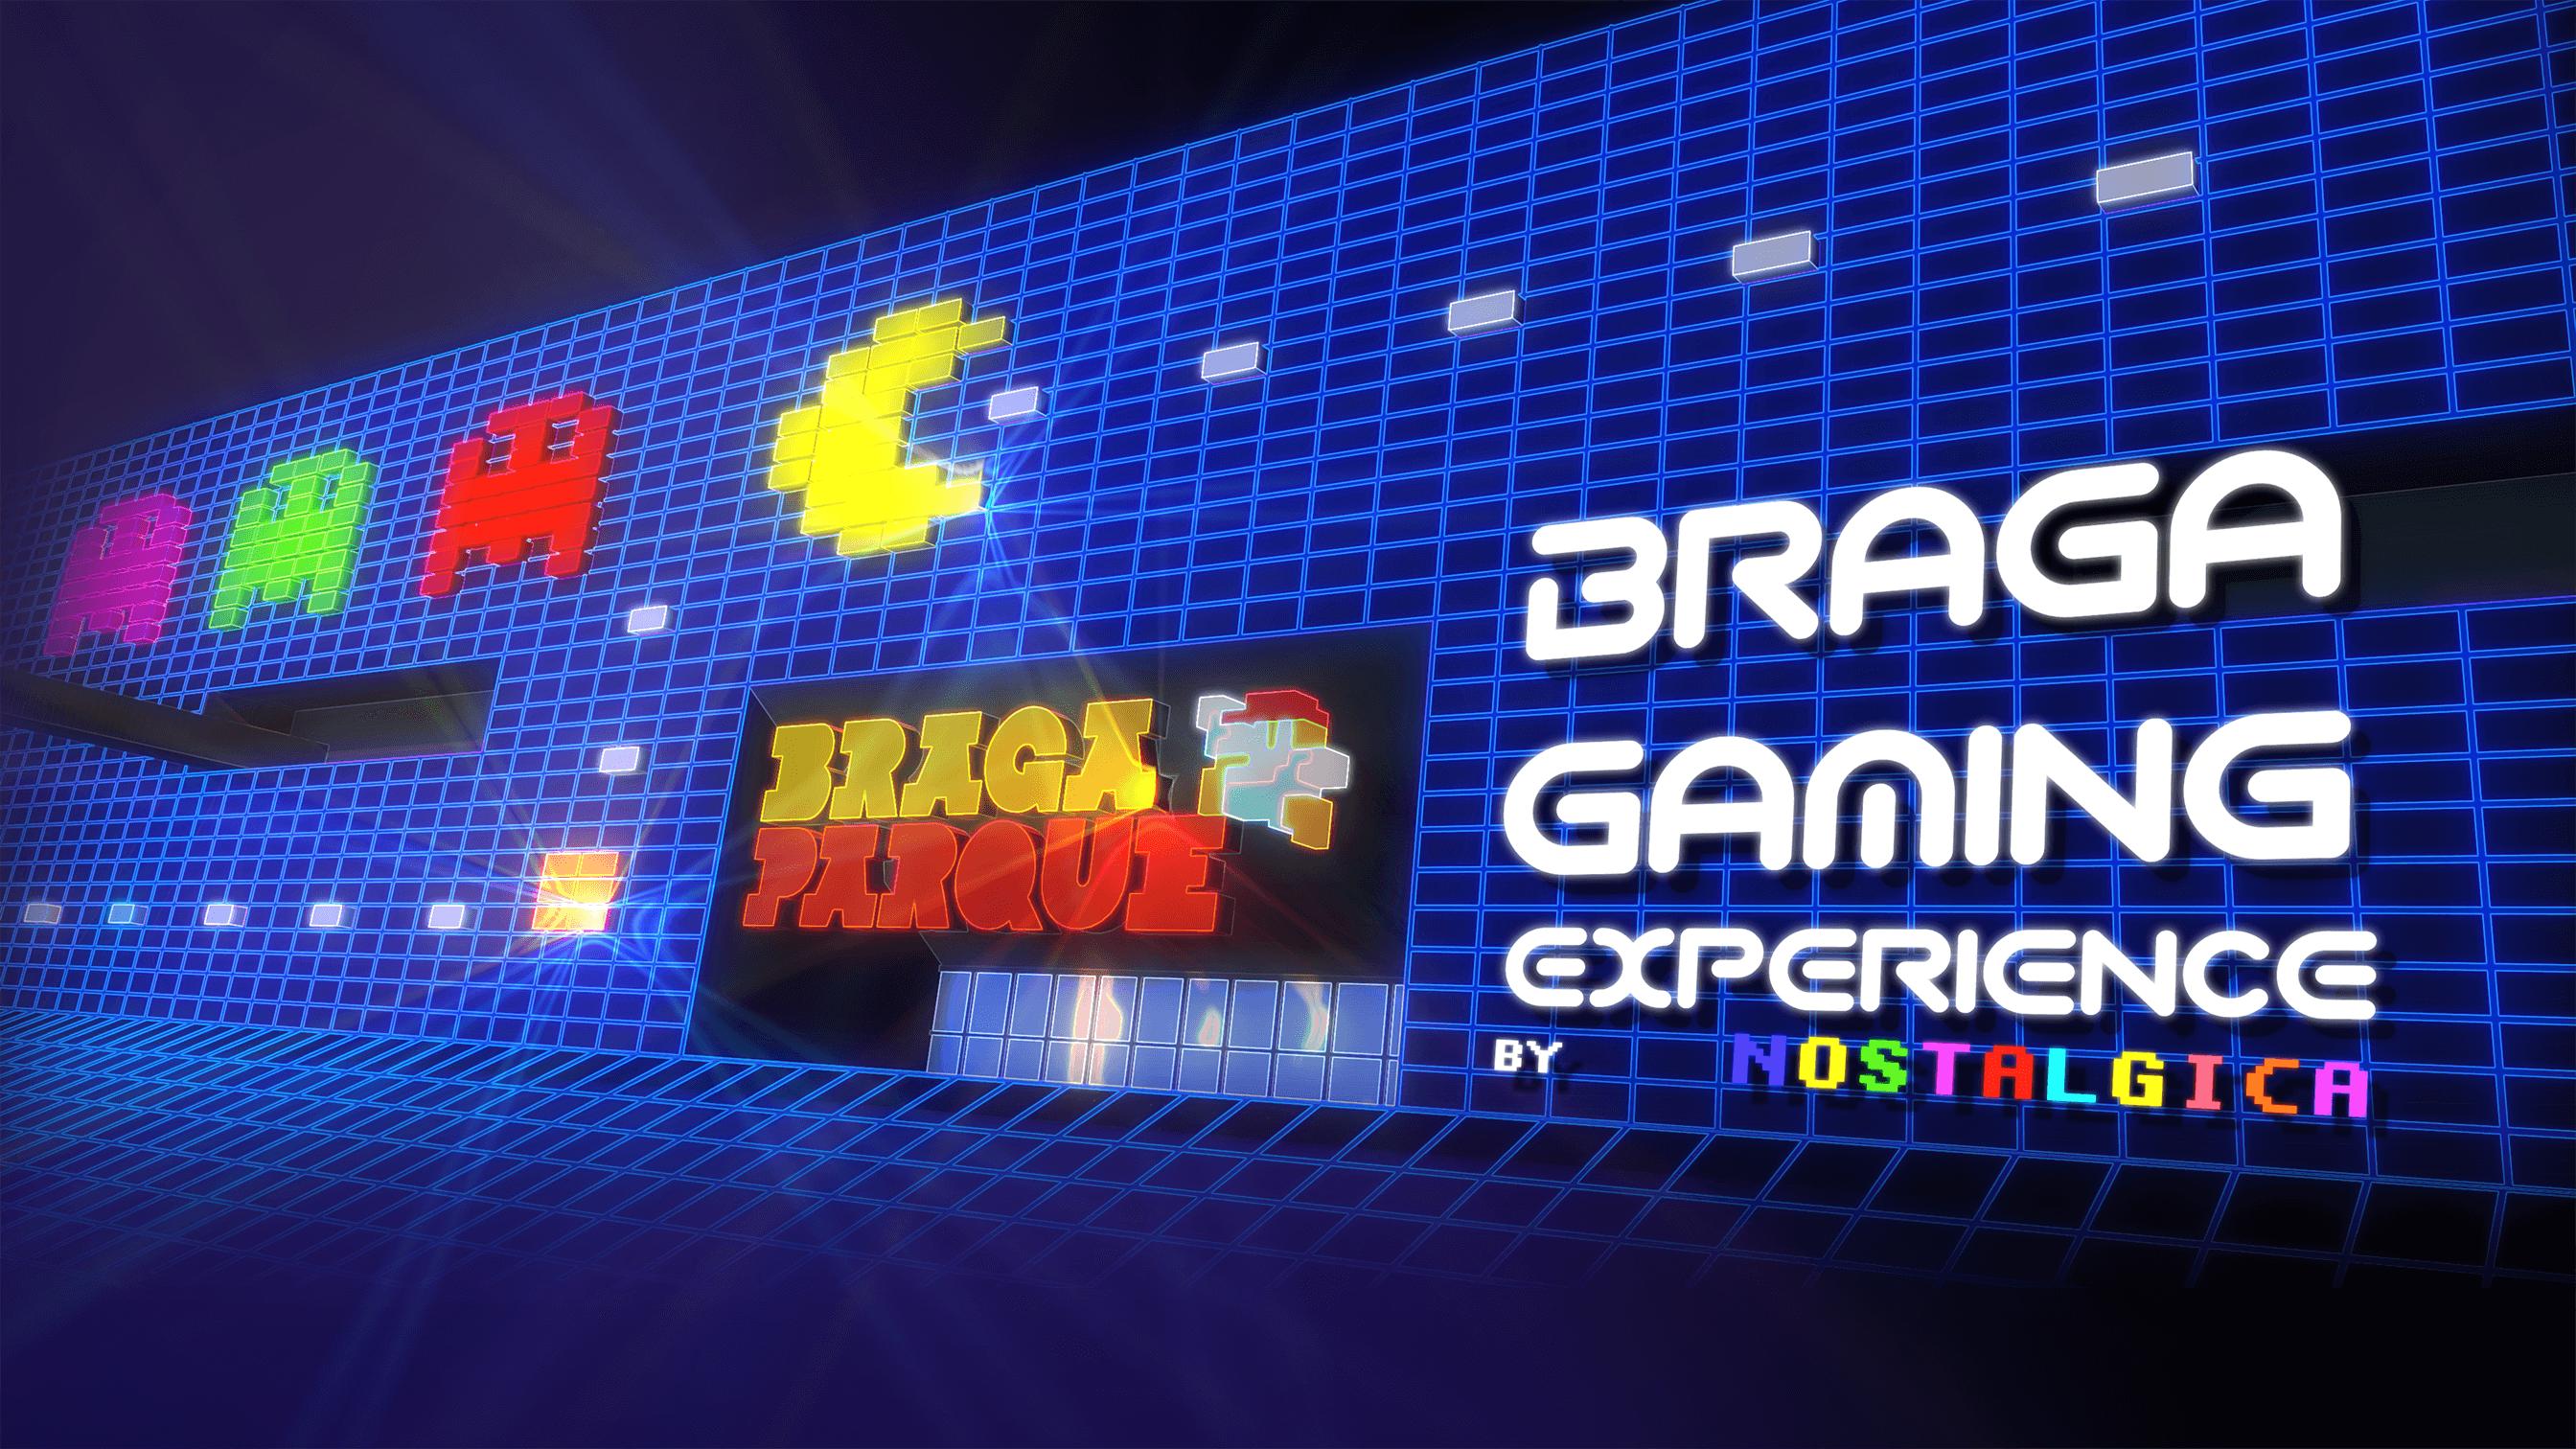 Braga Parque Gaming Experience